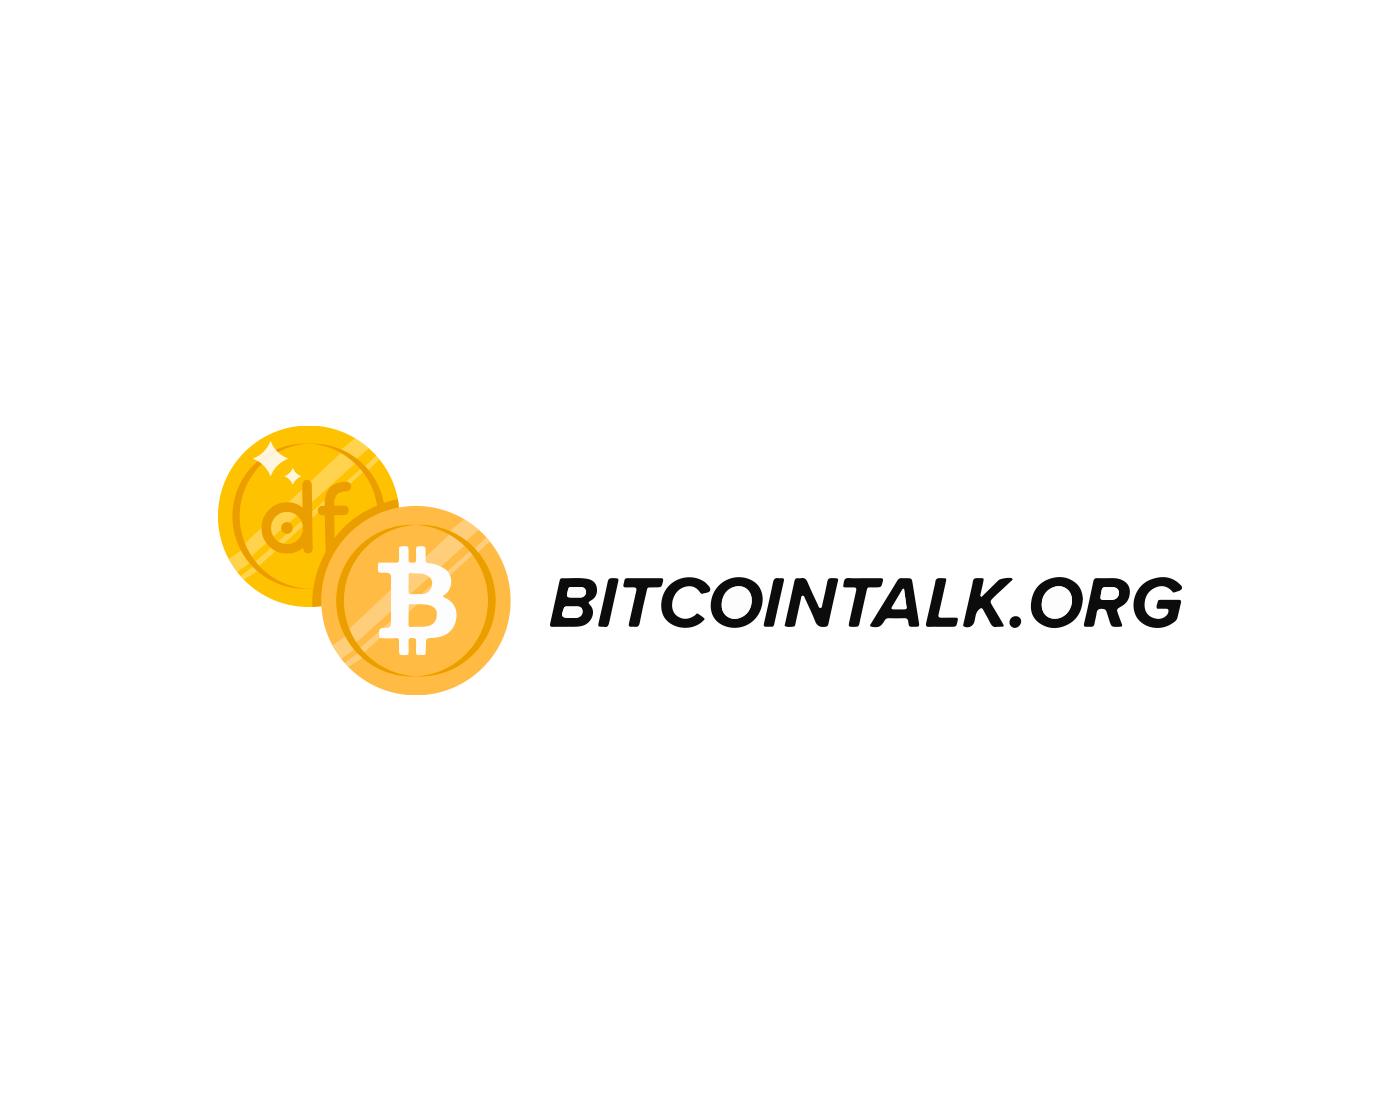 Bitcointalk pump bot